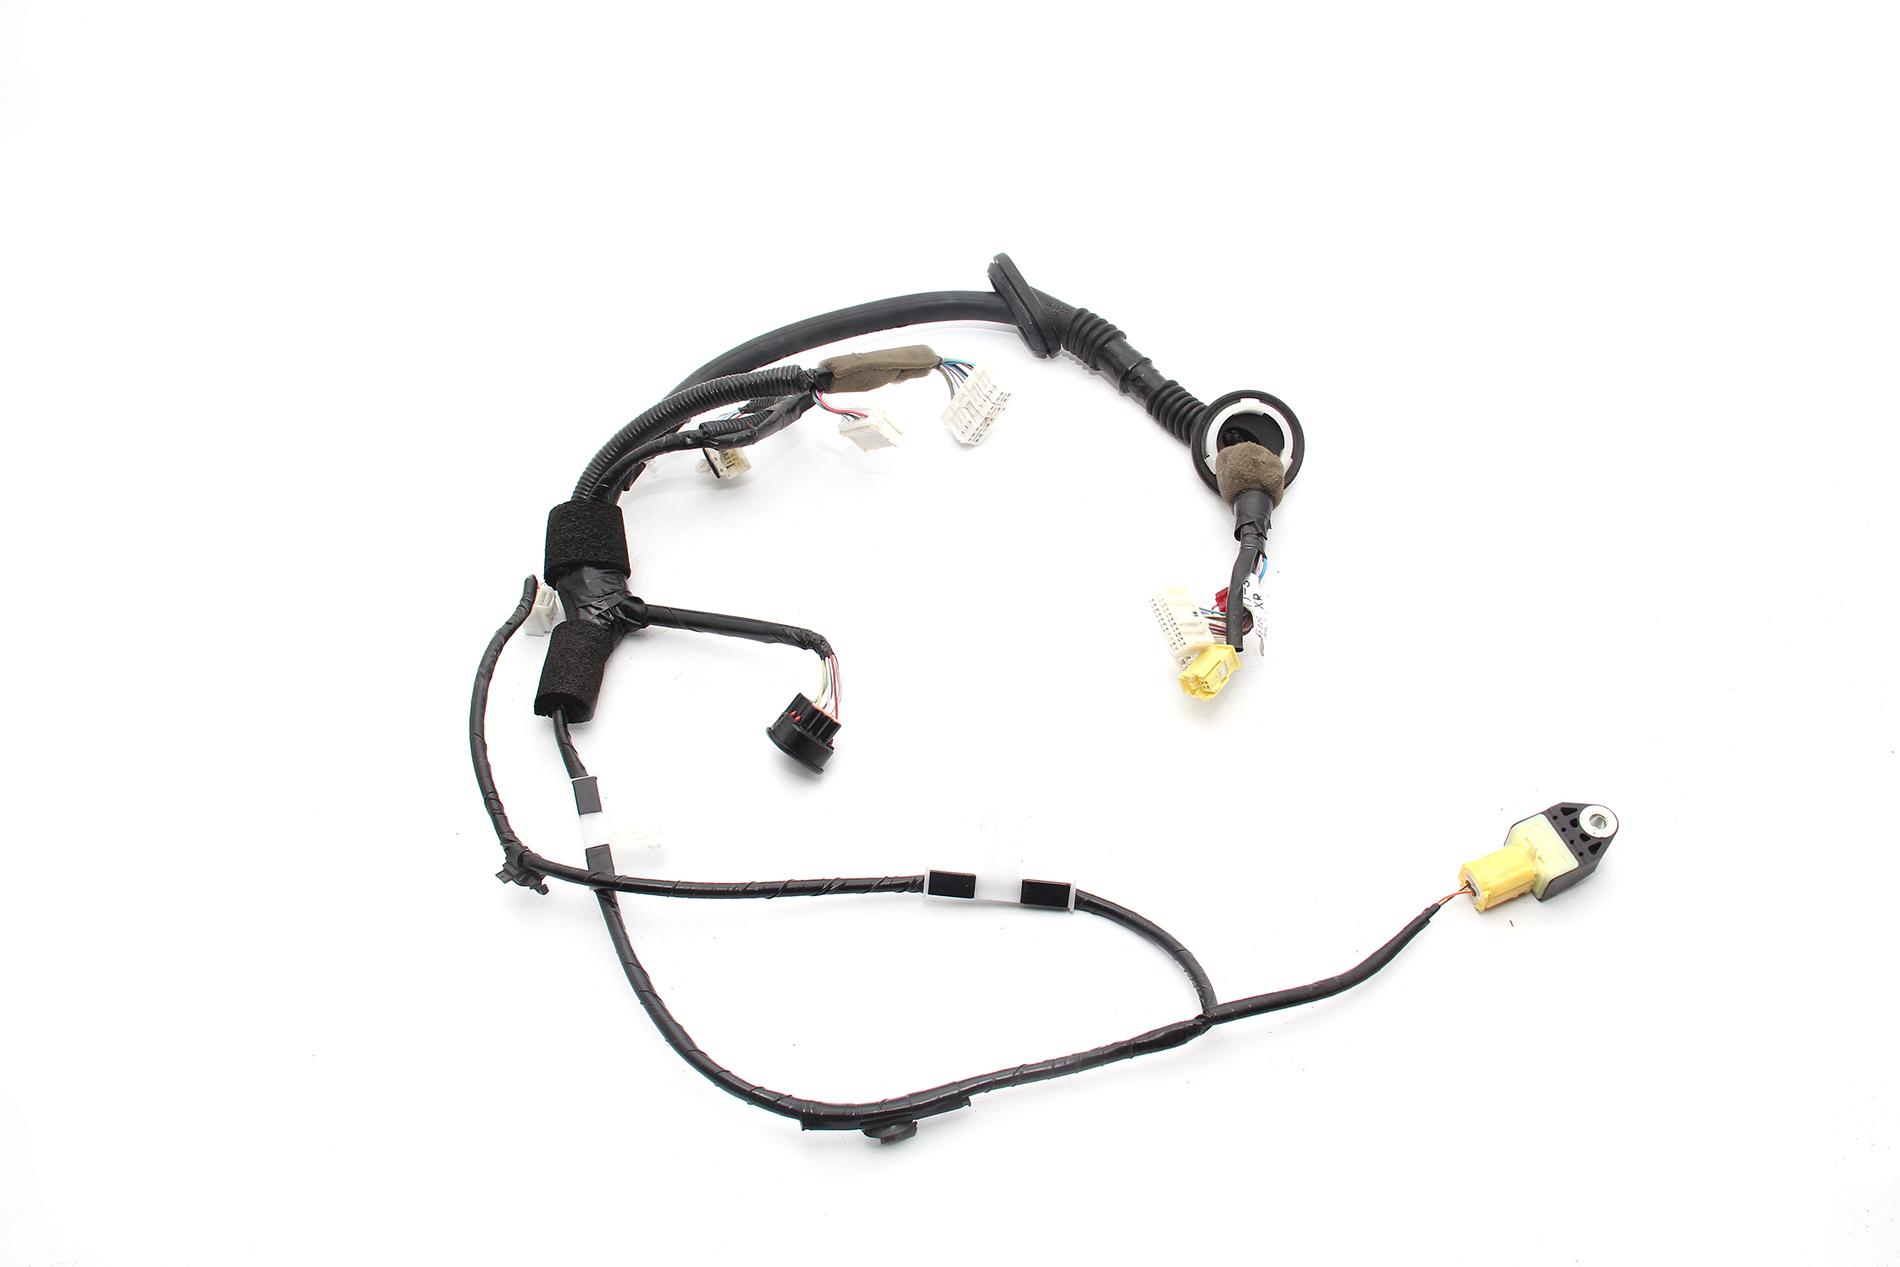 Scion FR-S FRS Front Door Wire Harness Left/Driver SU003